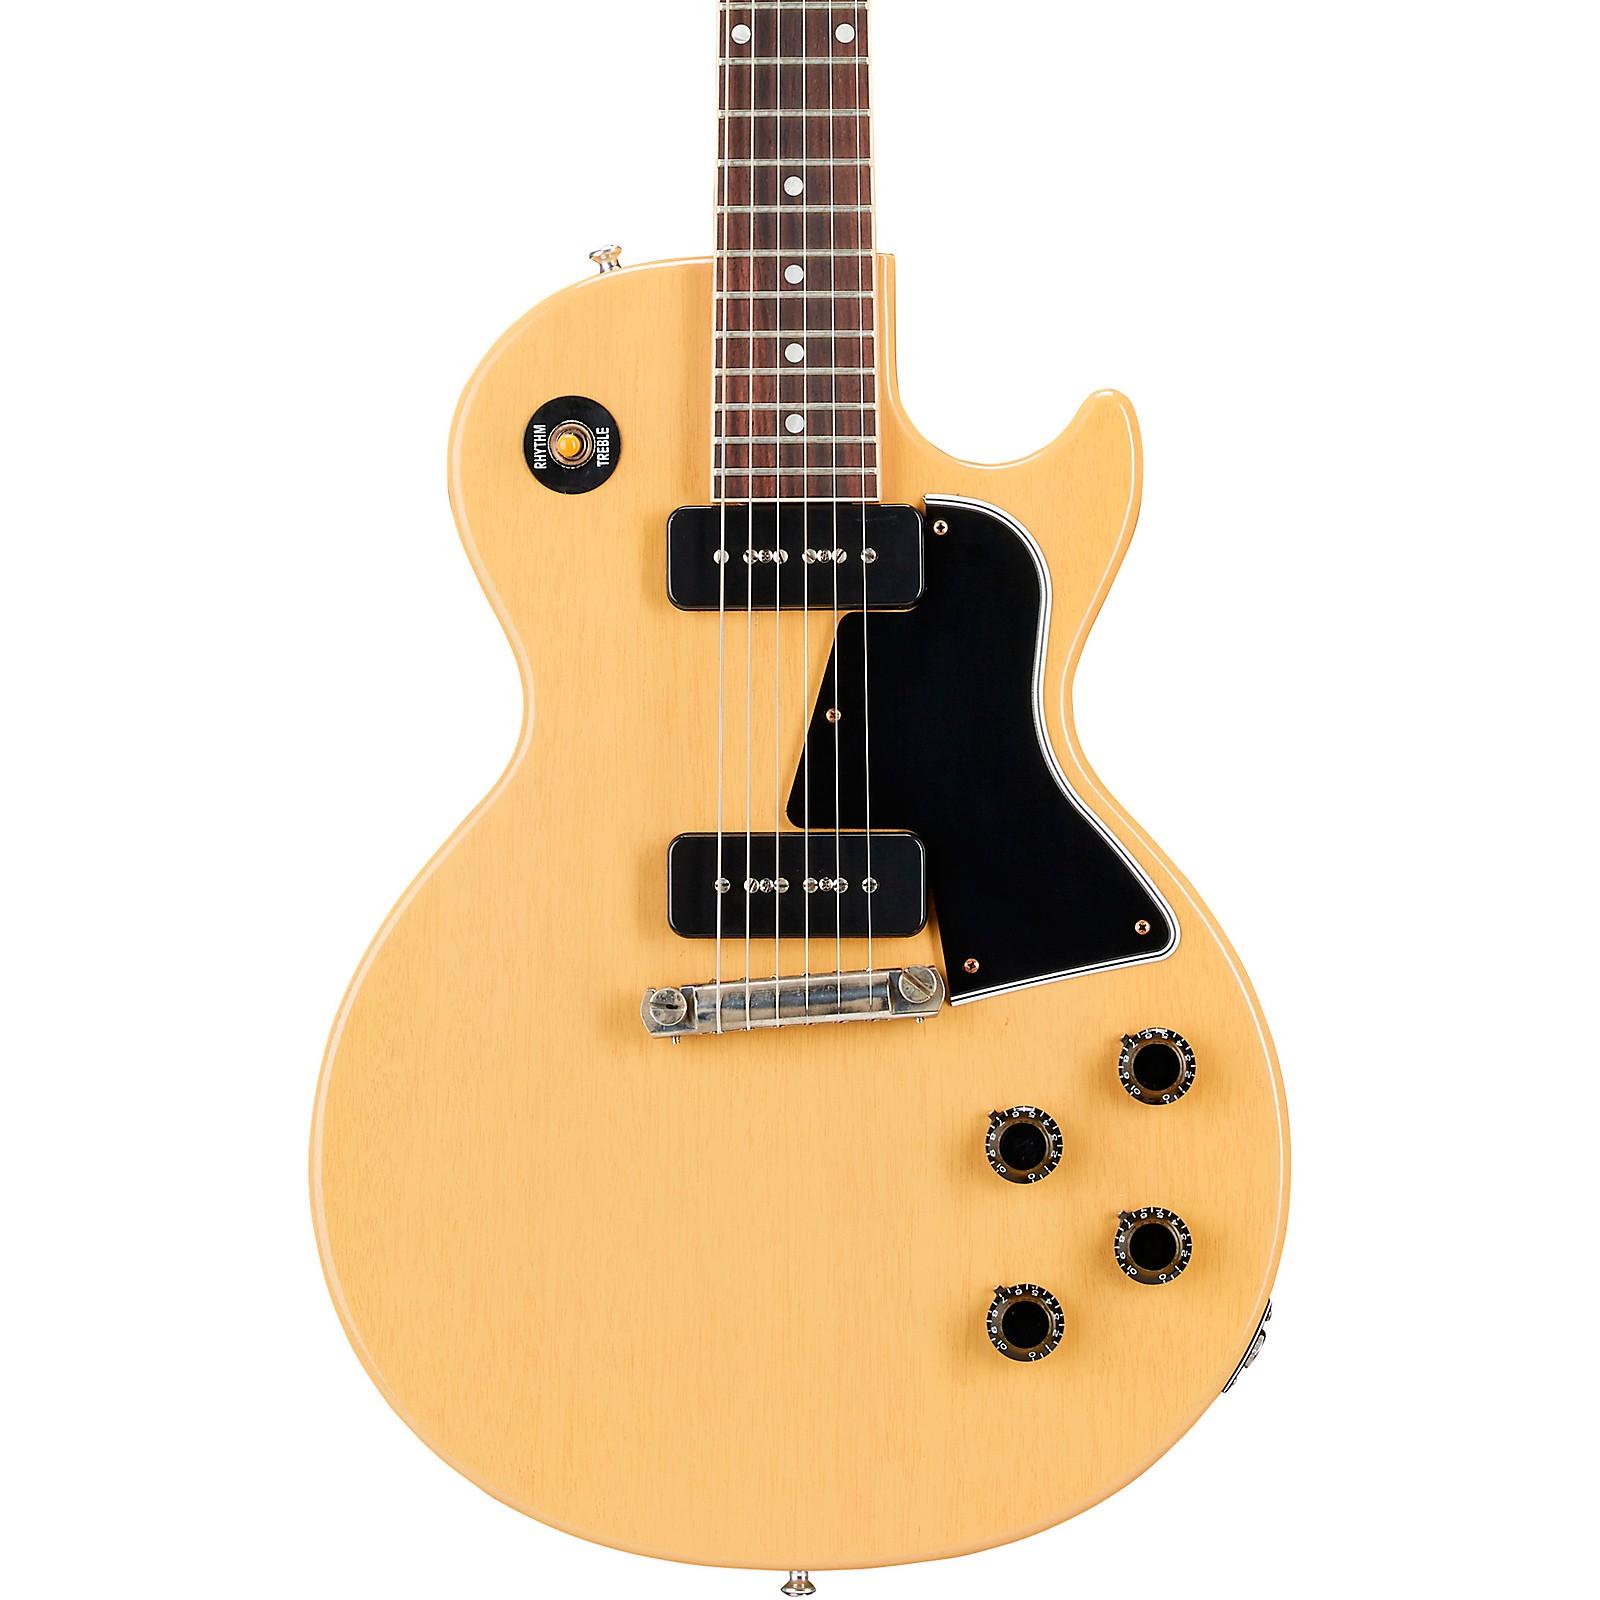 Gibson Custom 1957 Les Paul Special Single Cut Reissue VOS Electric Guitar